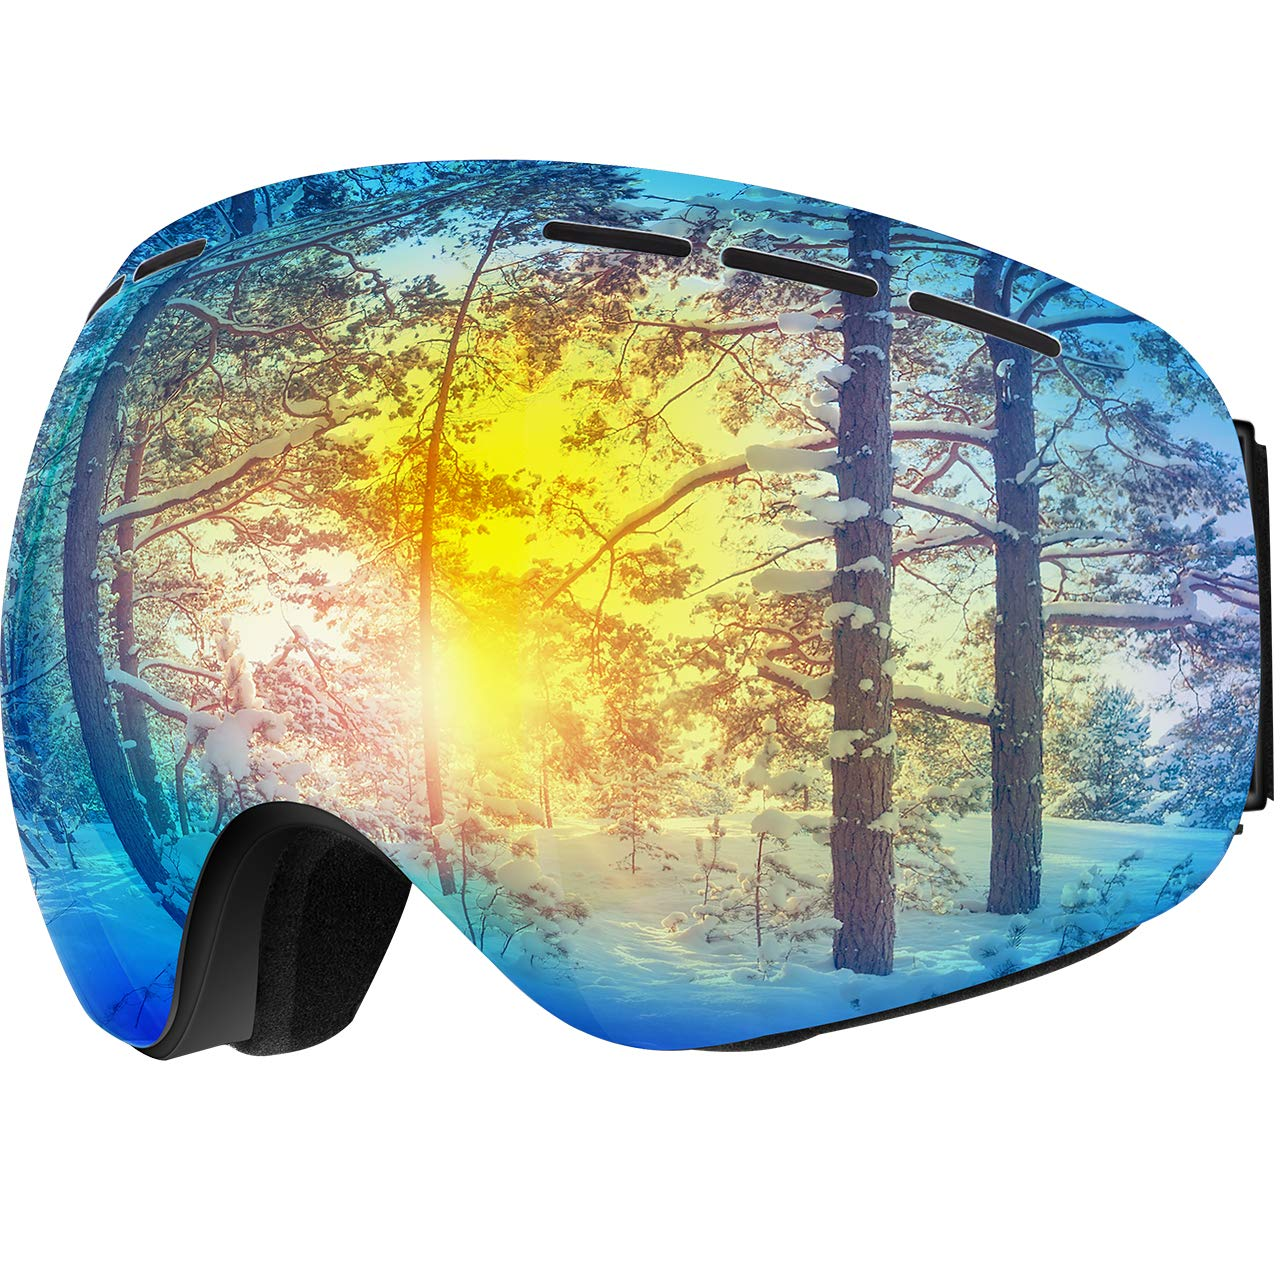 OMORC Skibrille, Snowboardbrille Fahmenlose Linse 100% UV-Schutz Anti-Nebel Skibrille